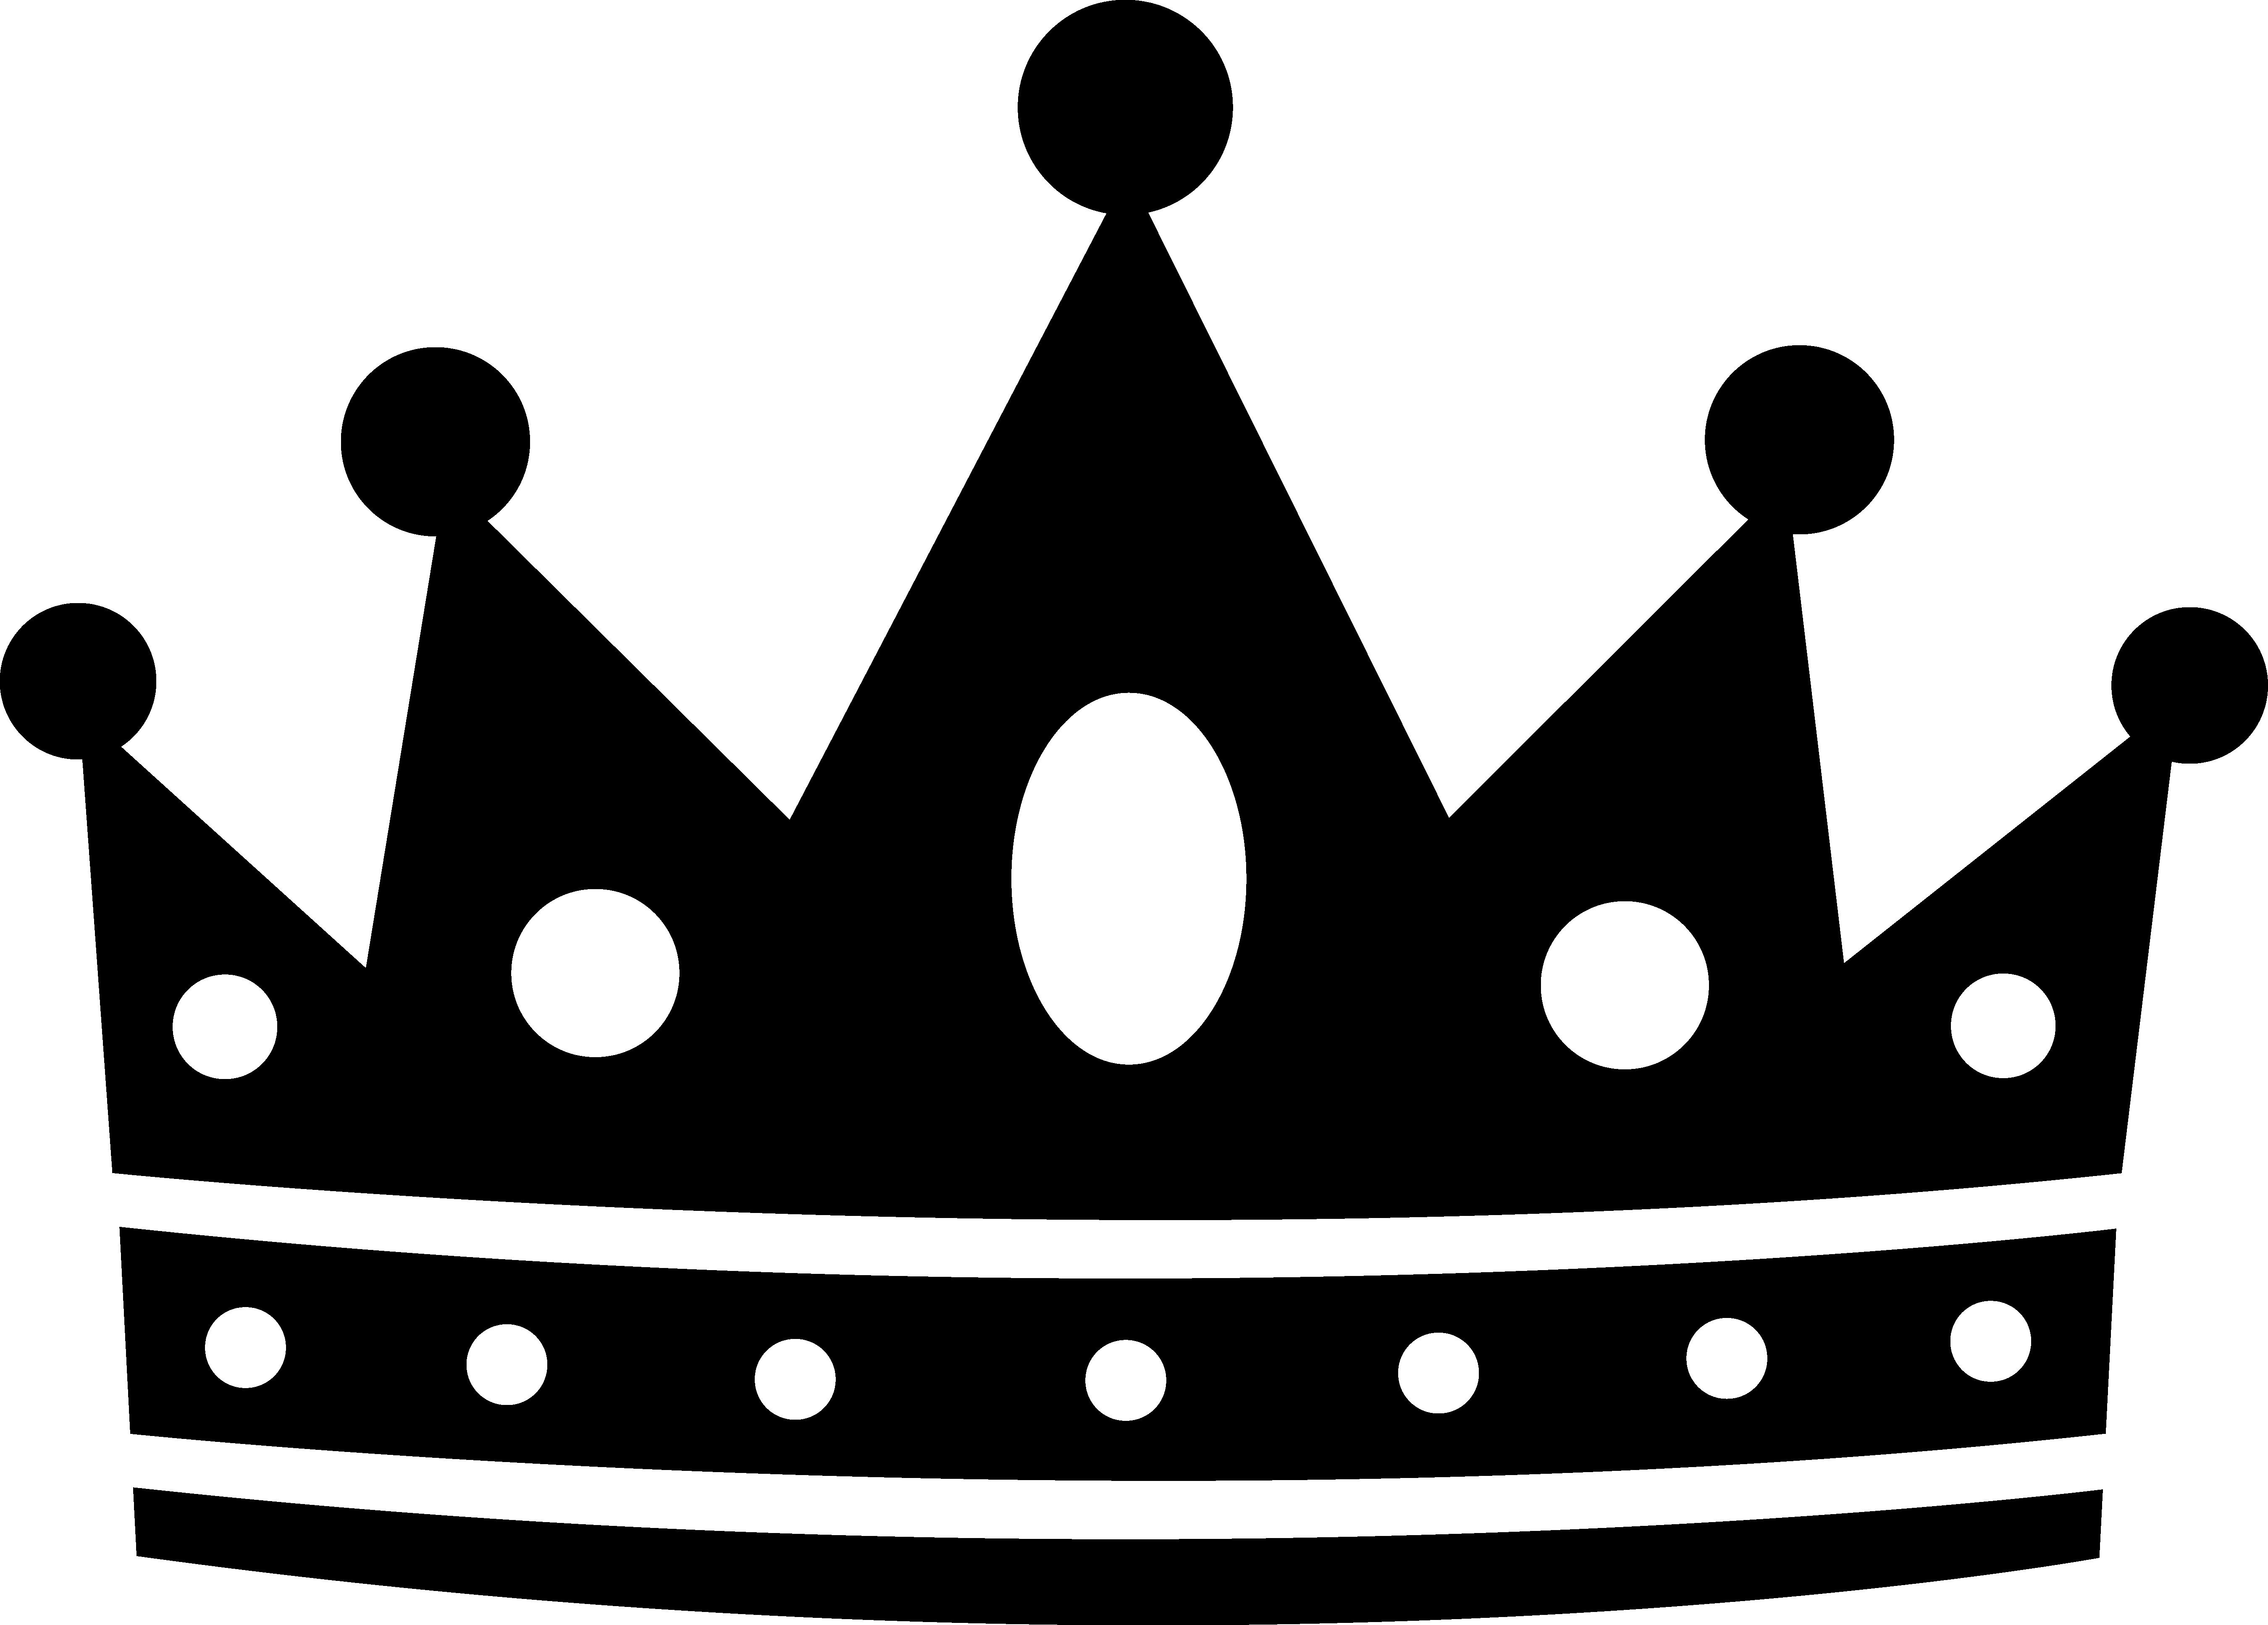 King Crown Clip Art Black And White Prin-King Crown Clip Art Black And White Princess Royal Crown Clip Art-3